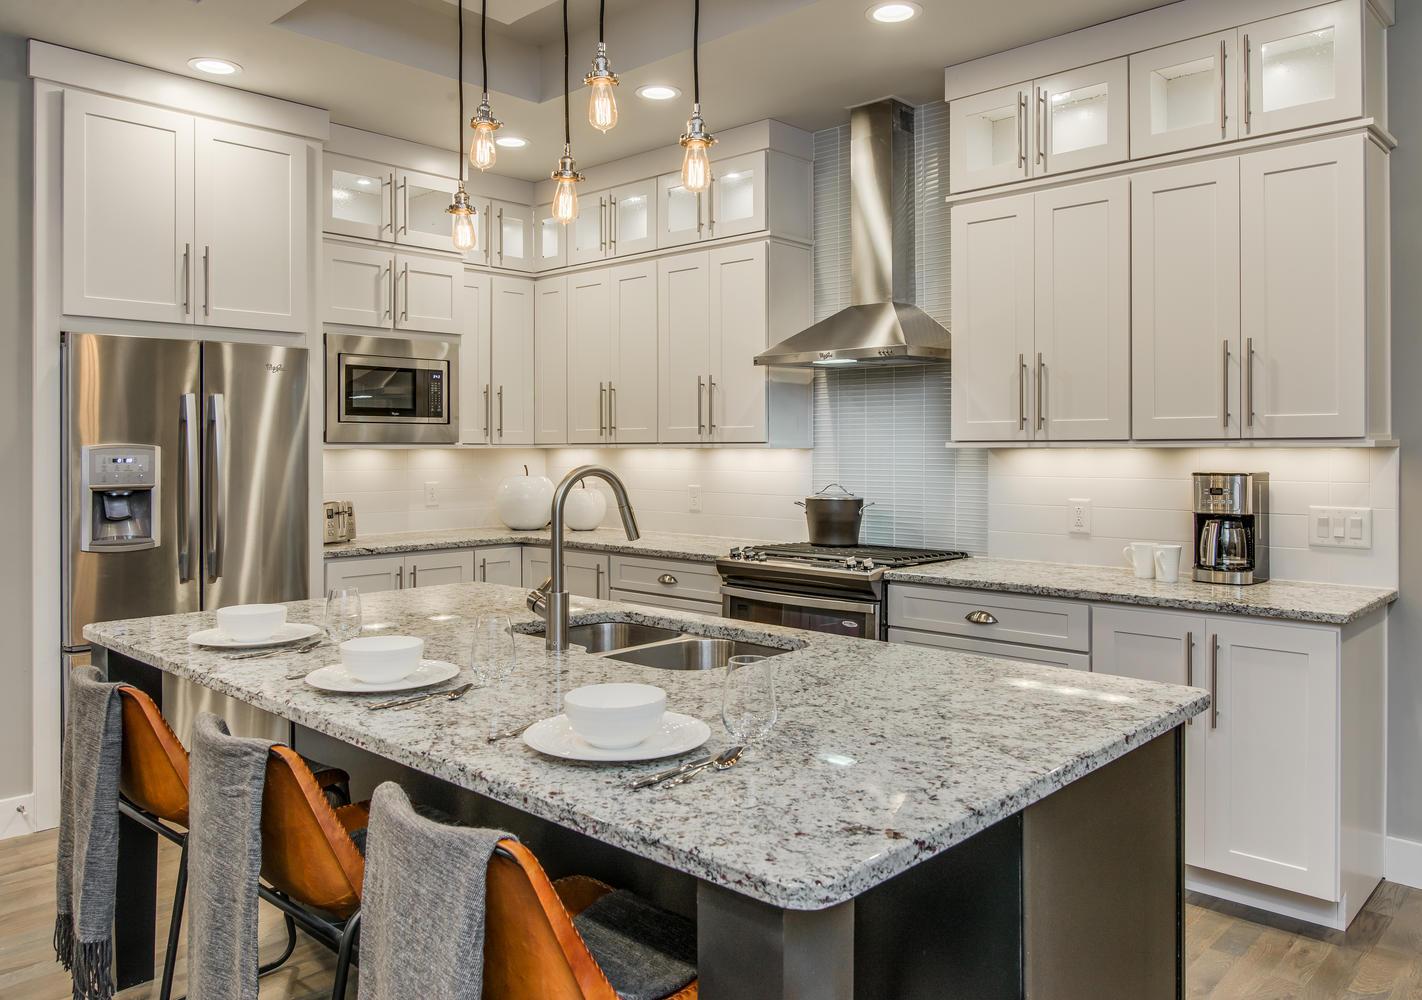 House-Plans-Online-Duplex-Nashville-Peggy-Newman-Kitchen-1613.jpg